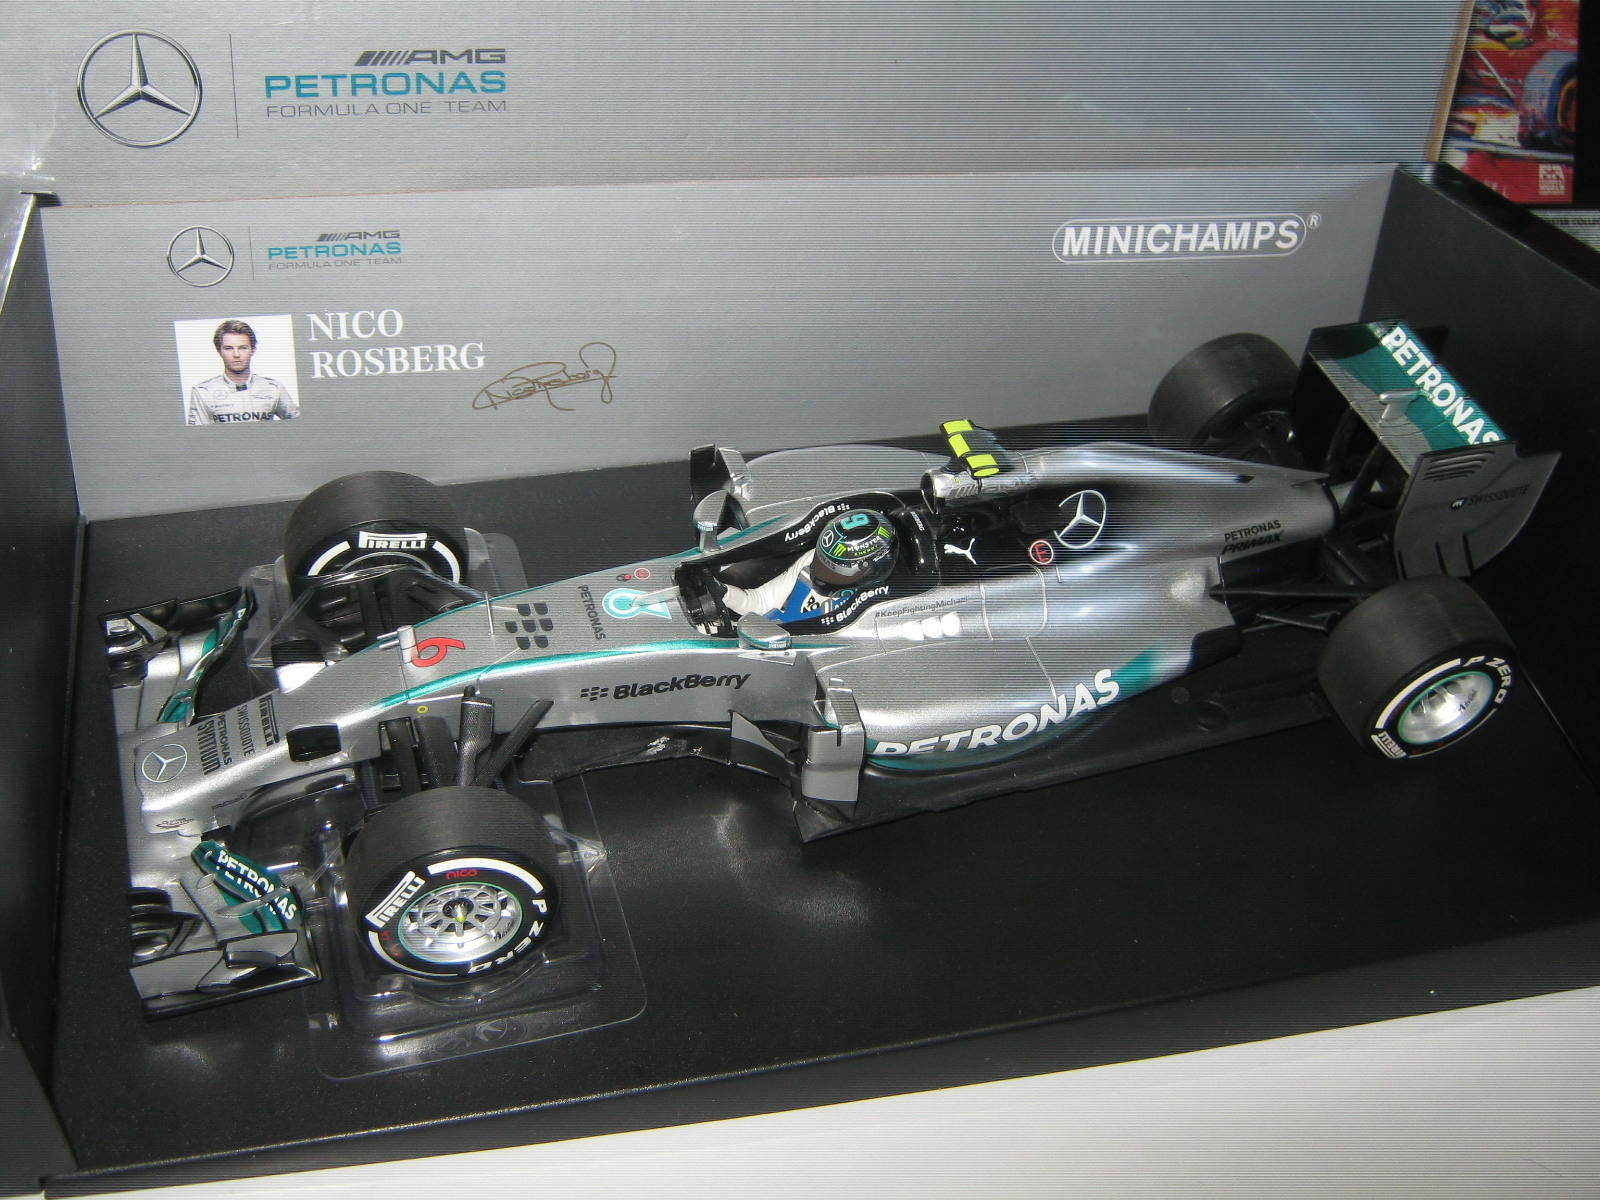 1 18 Mercedes MGP w05 2014 N.  rosberg Australian GP 110140006 Minichamps Ovp Neuf  pas de taxes